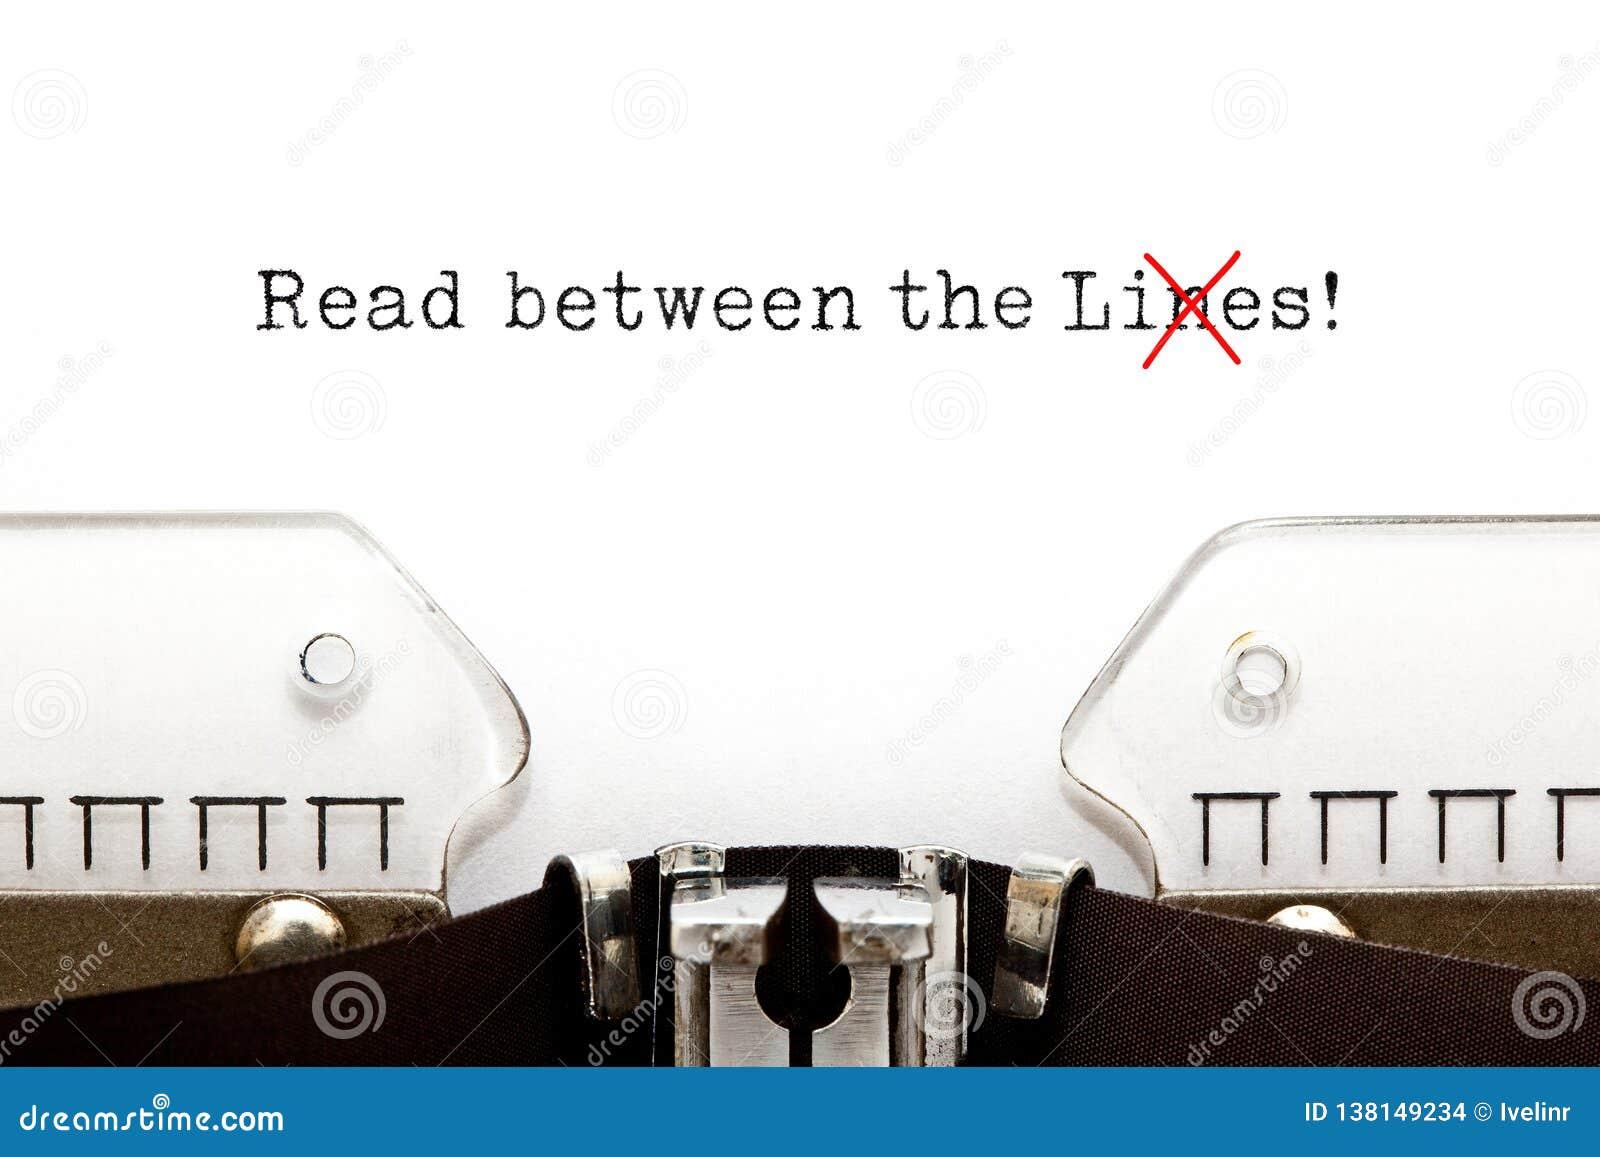 Lido entre o conceito das mentiras na máquina de escrever